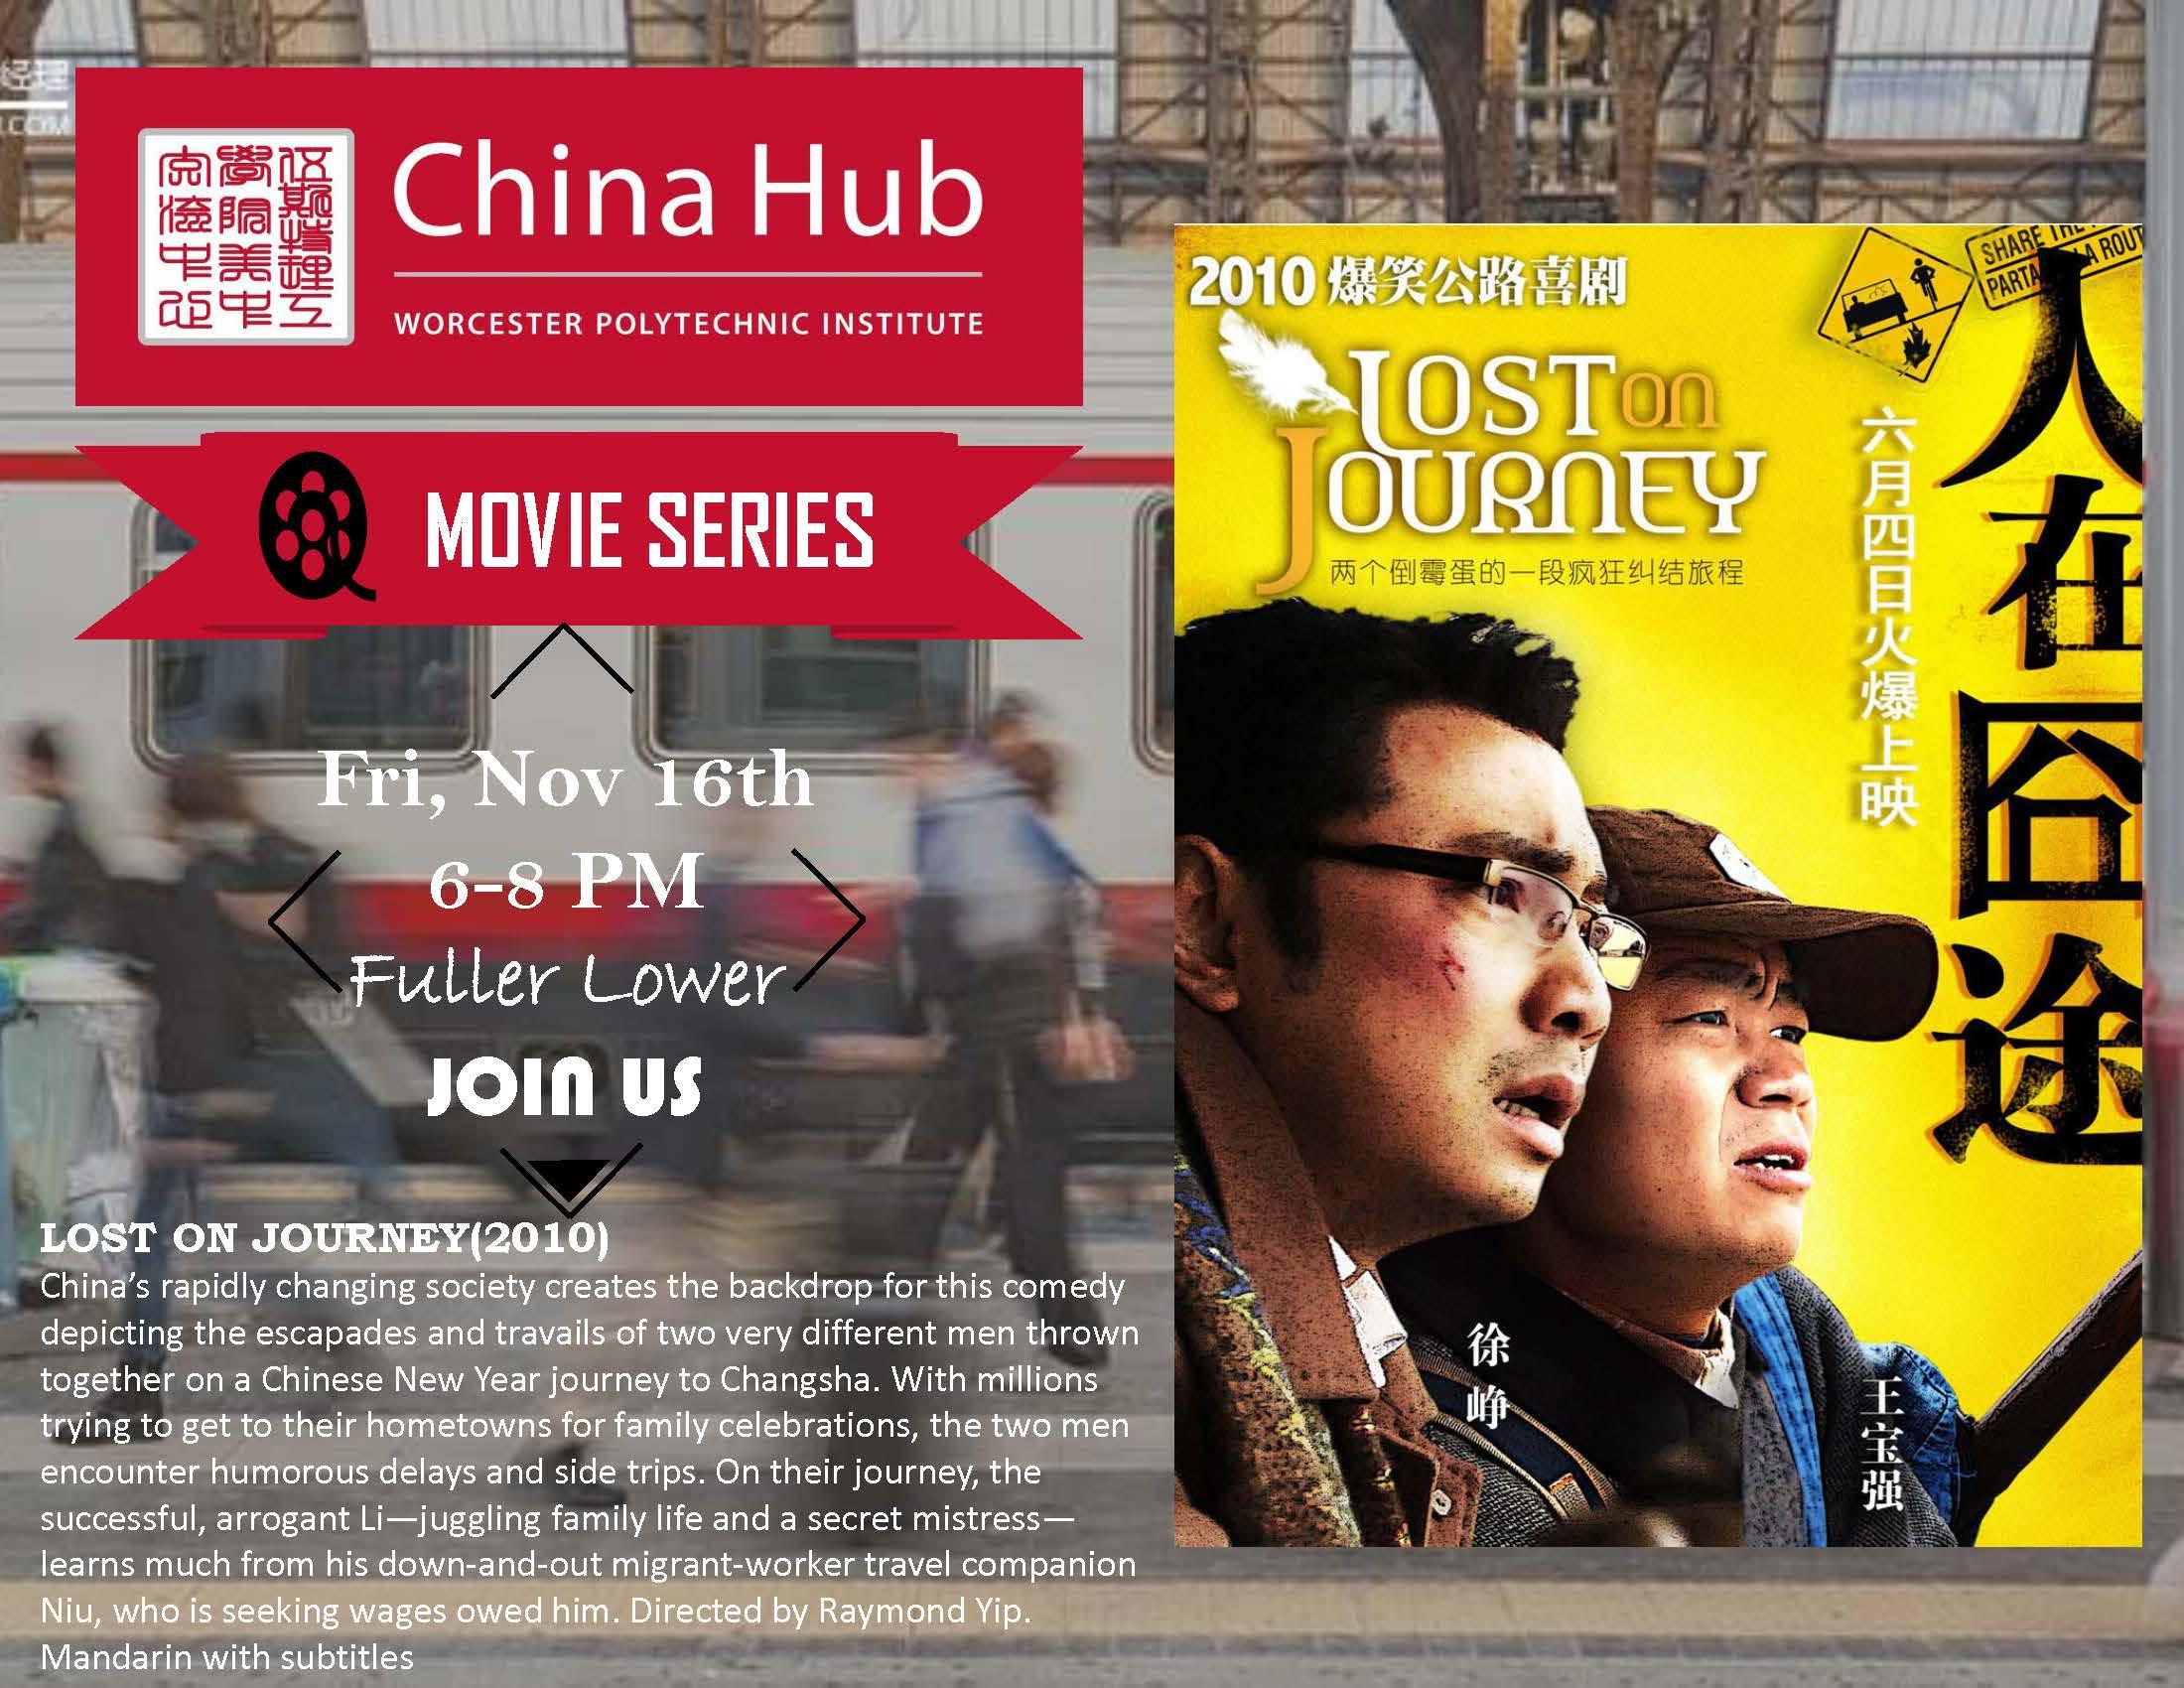 China Hub film